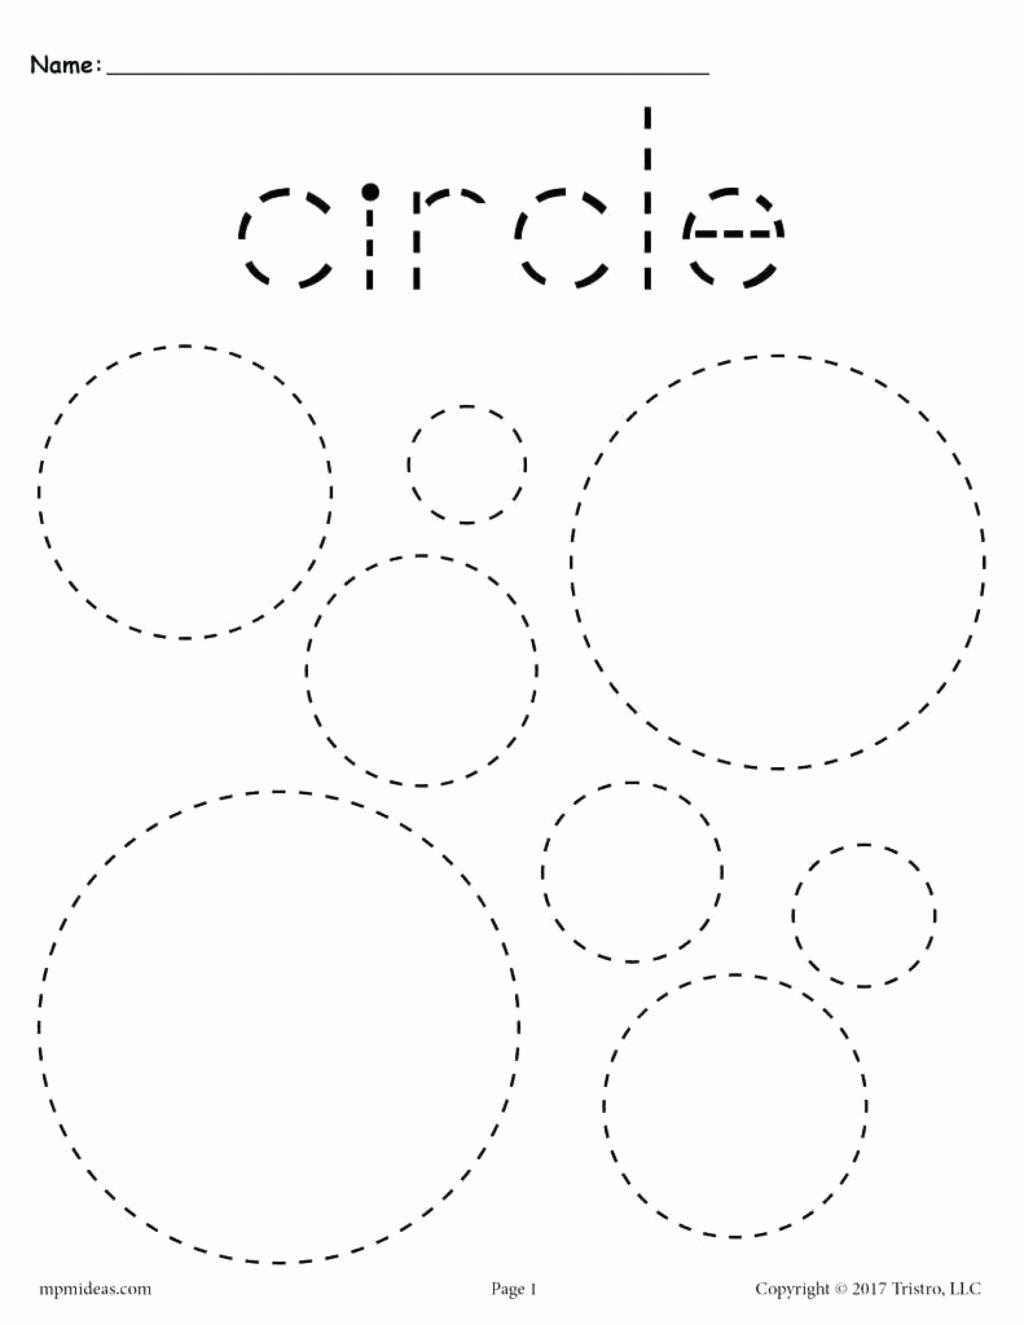 Circle Shape Worksheets for Preschoolers Best Of Worksheet Worksheet Free Activity Sheets for Preschoolers